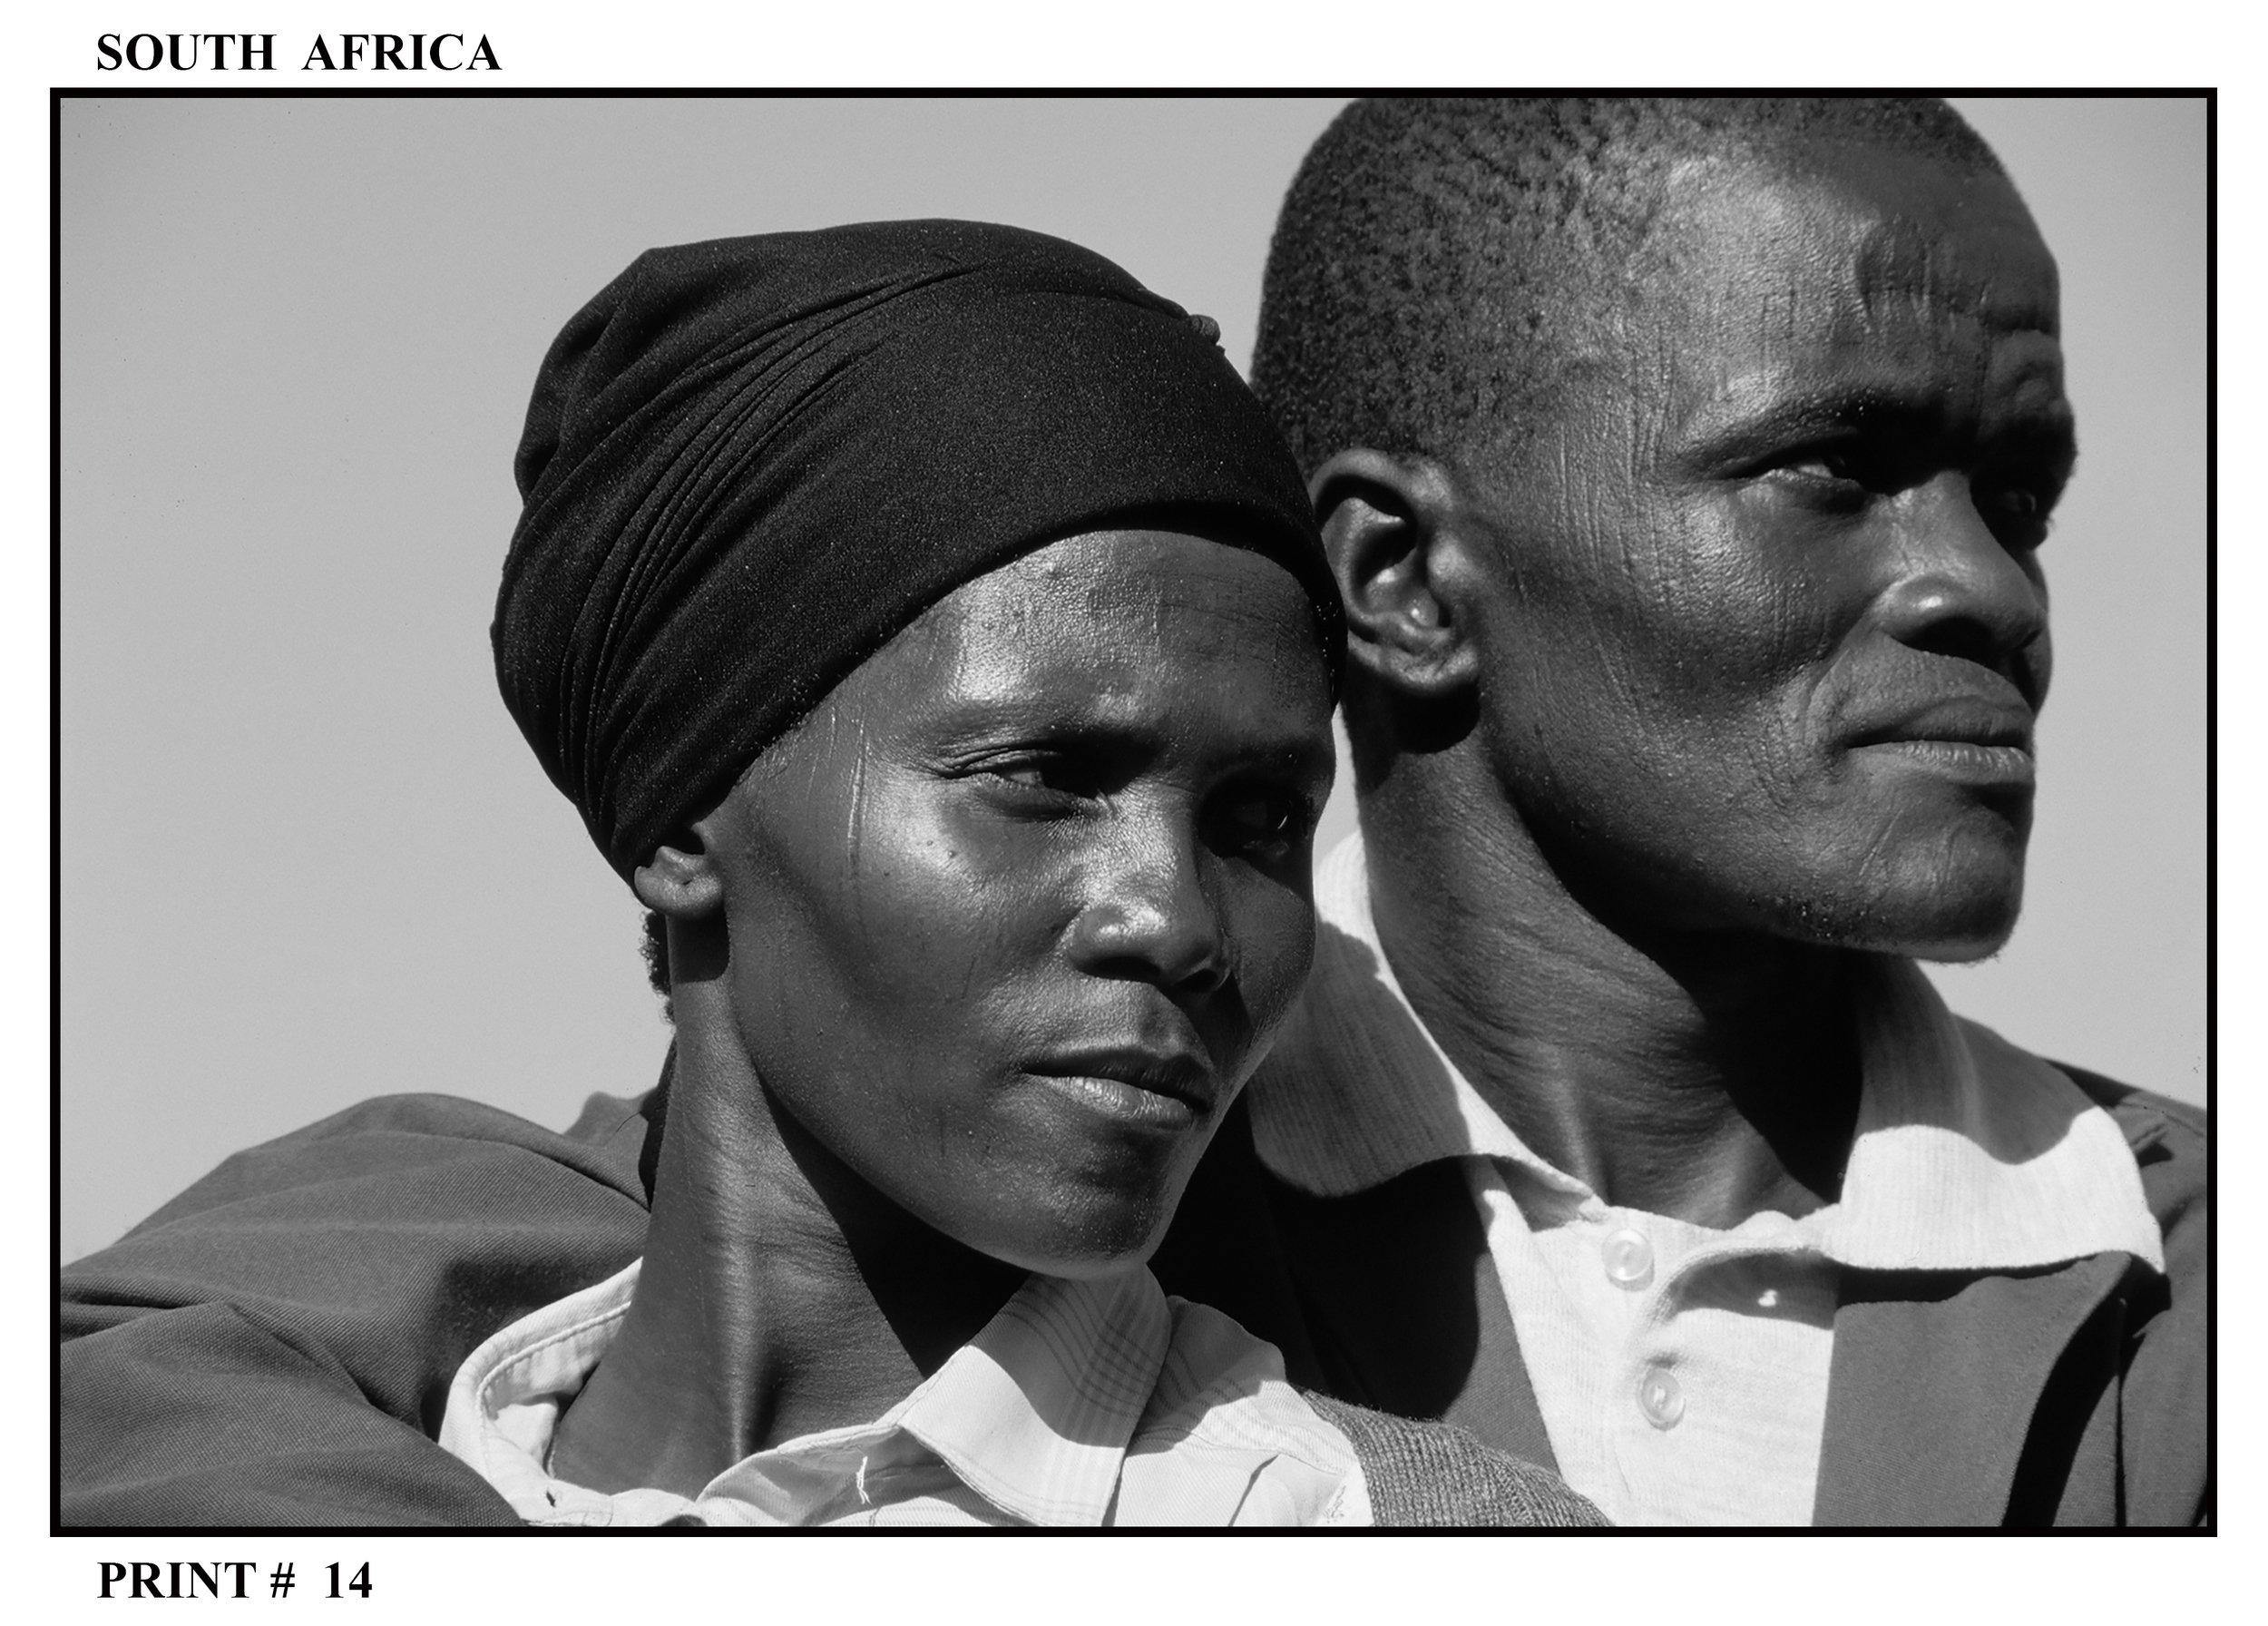 014SOUTH AFRICA copy.jpg